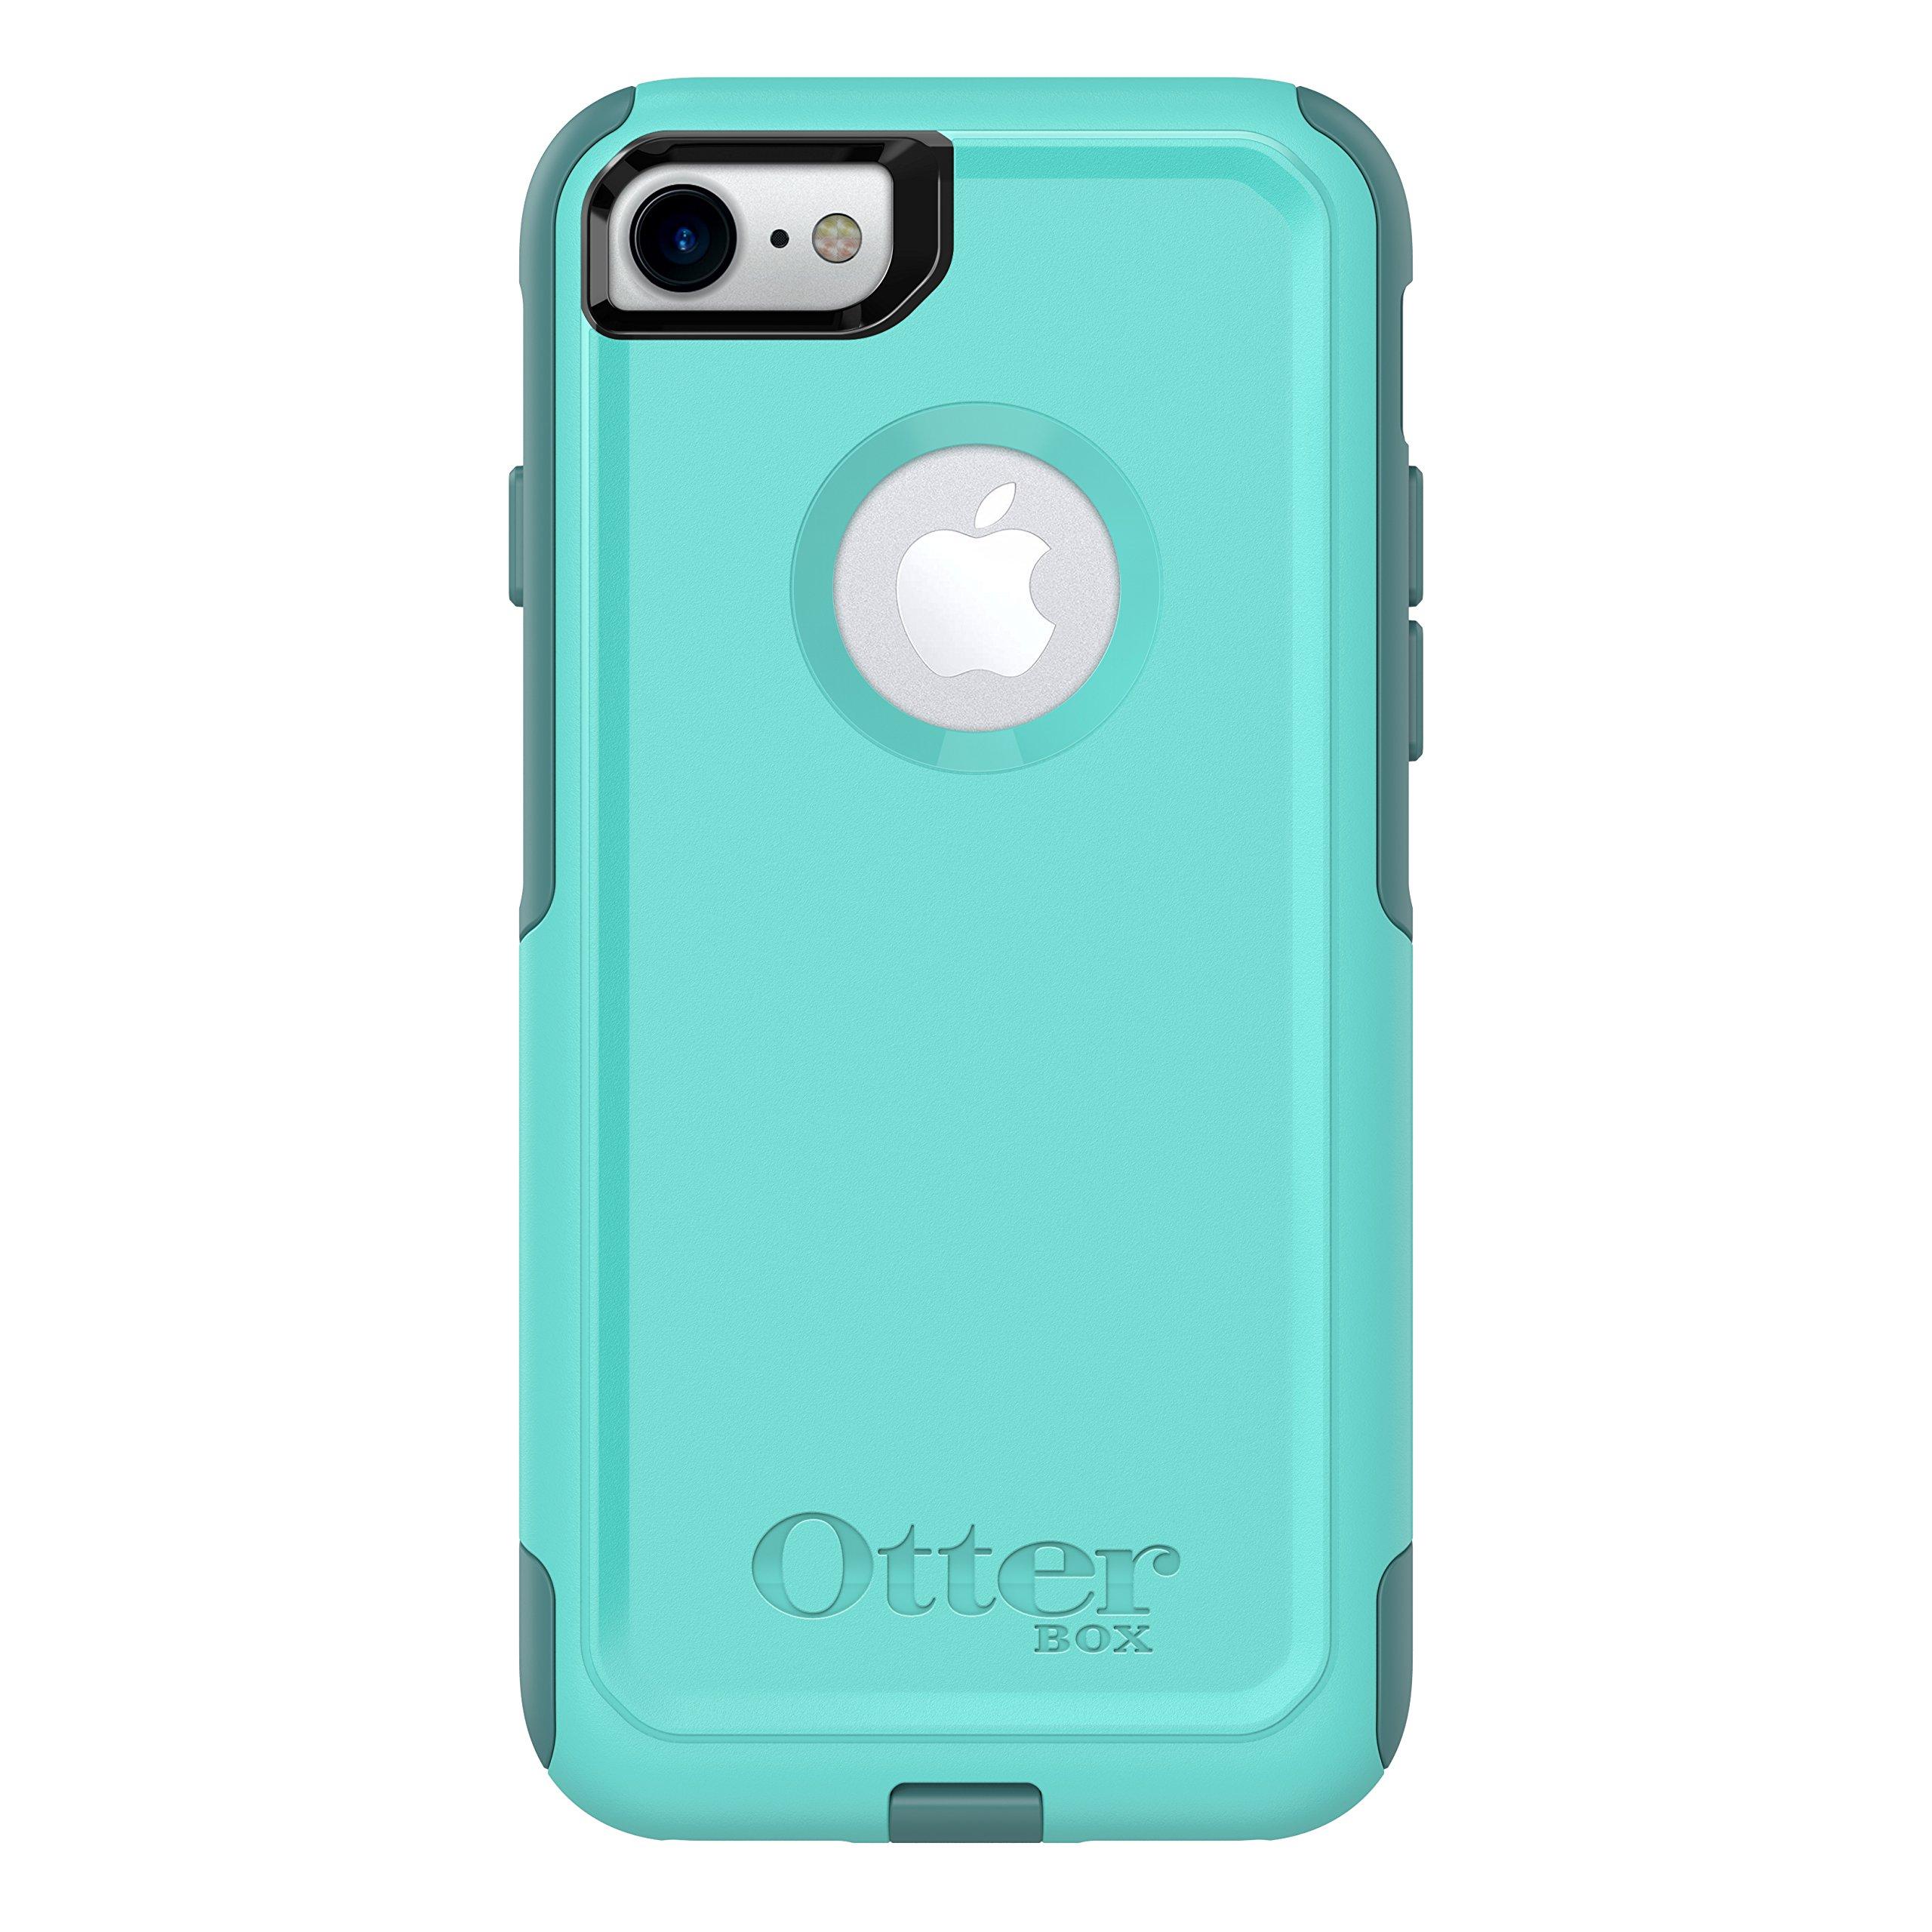 OtterBox COMMUTER SERIES Case for iPhone 8 & iPhone 7 (NOT Plus) - Frustration Free Packaging - AQUA MINT WAY (AQUA MINT/MOUNTAIN RANGE GREEN)